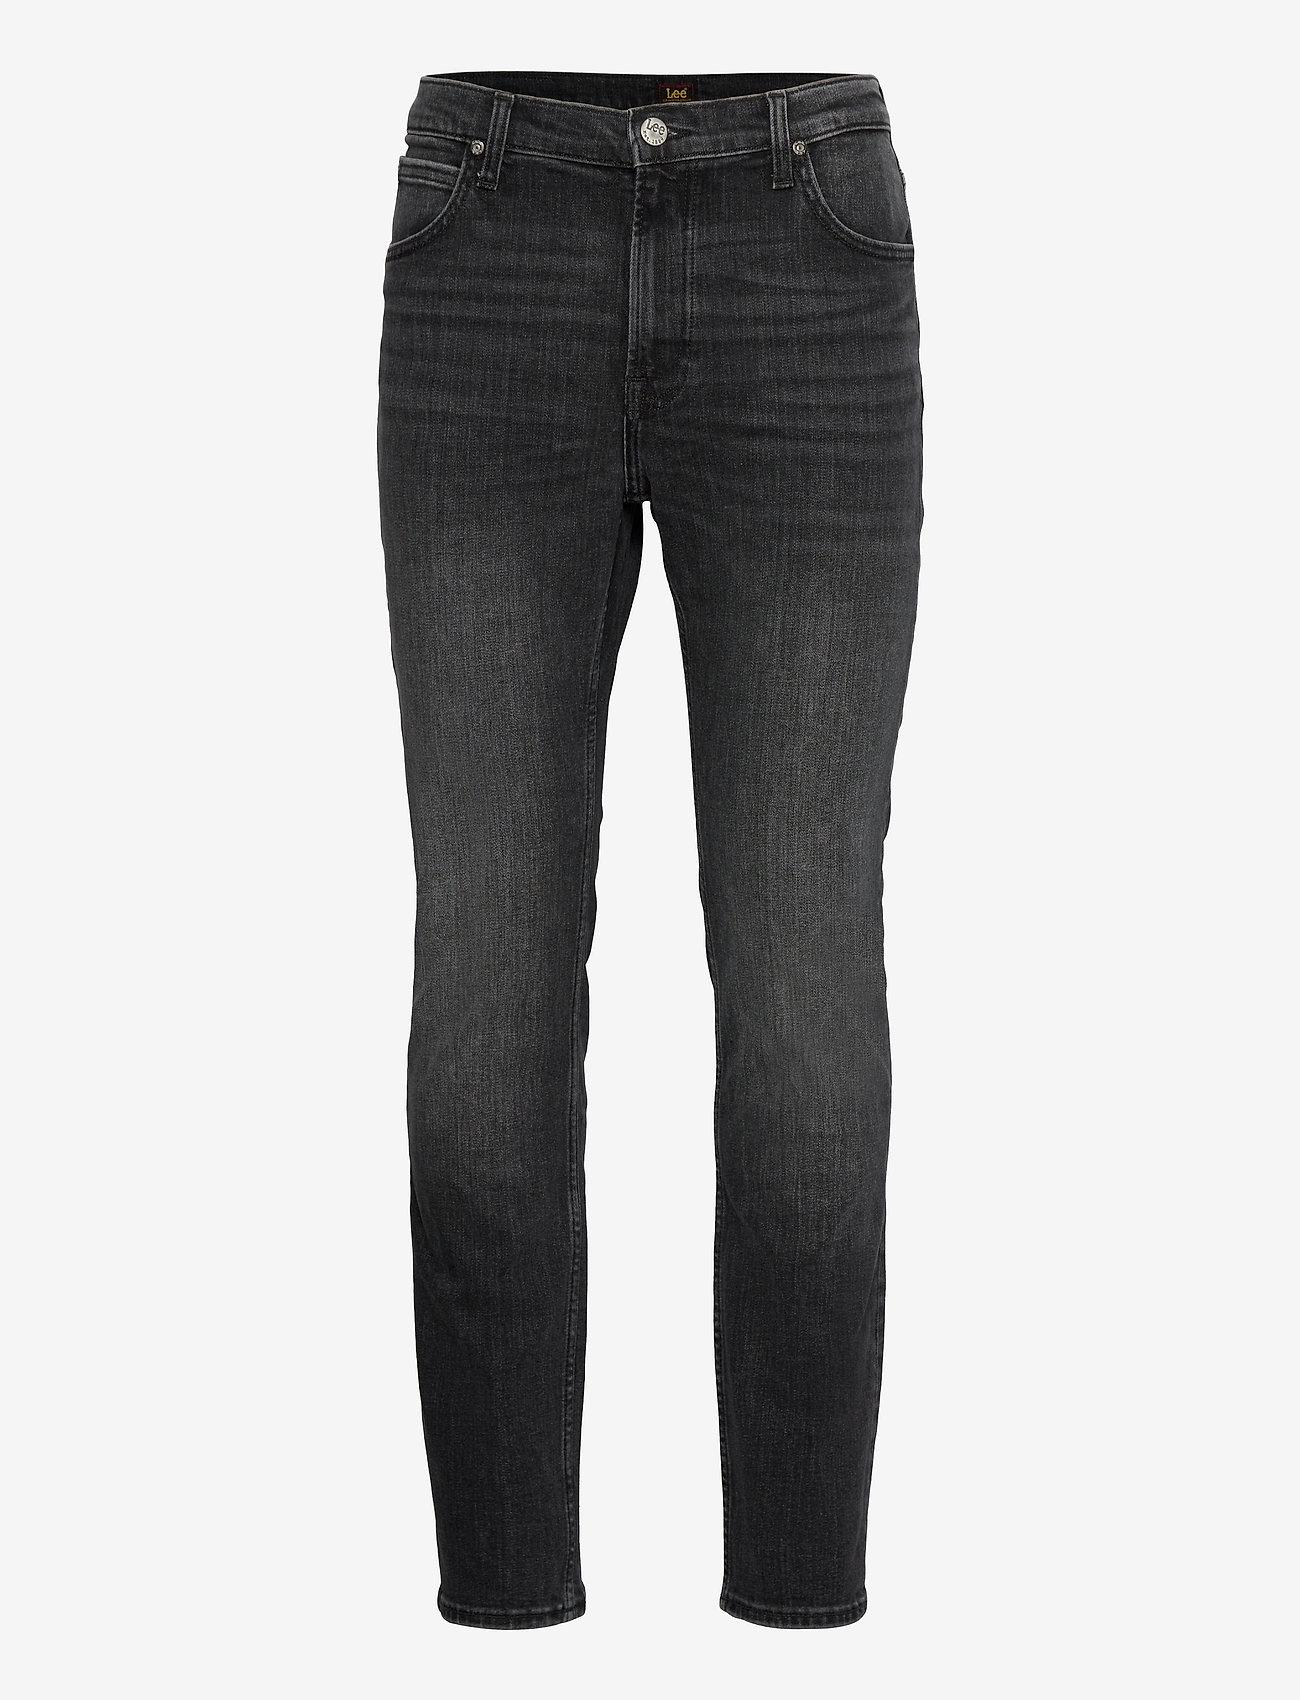 Lee Jeans - RIDER - slim jeans - dk worn magnet - 0